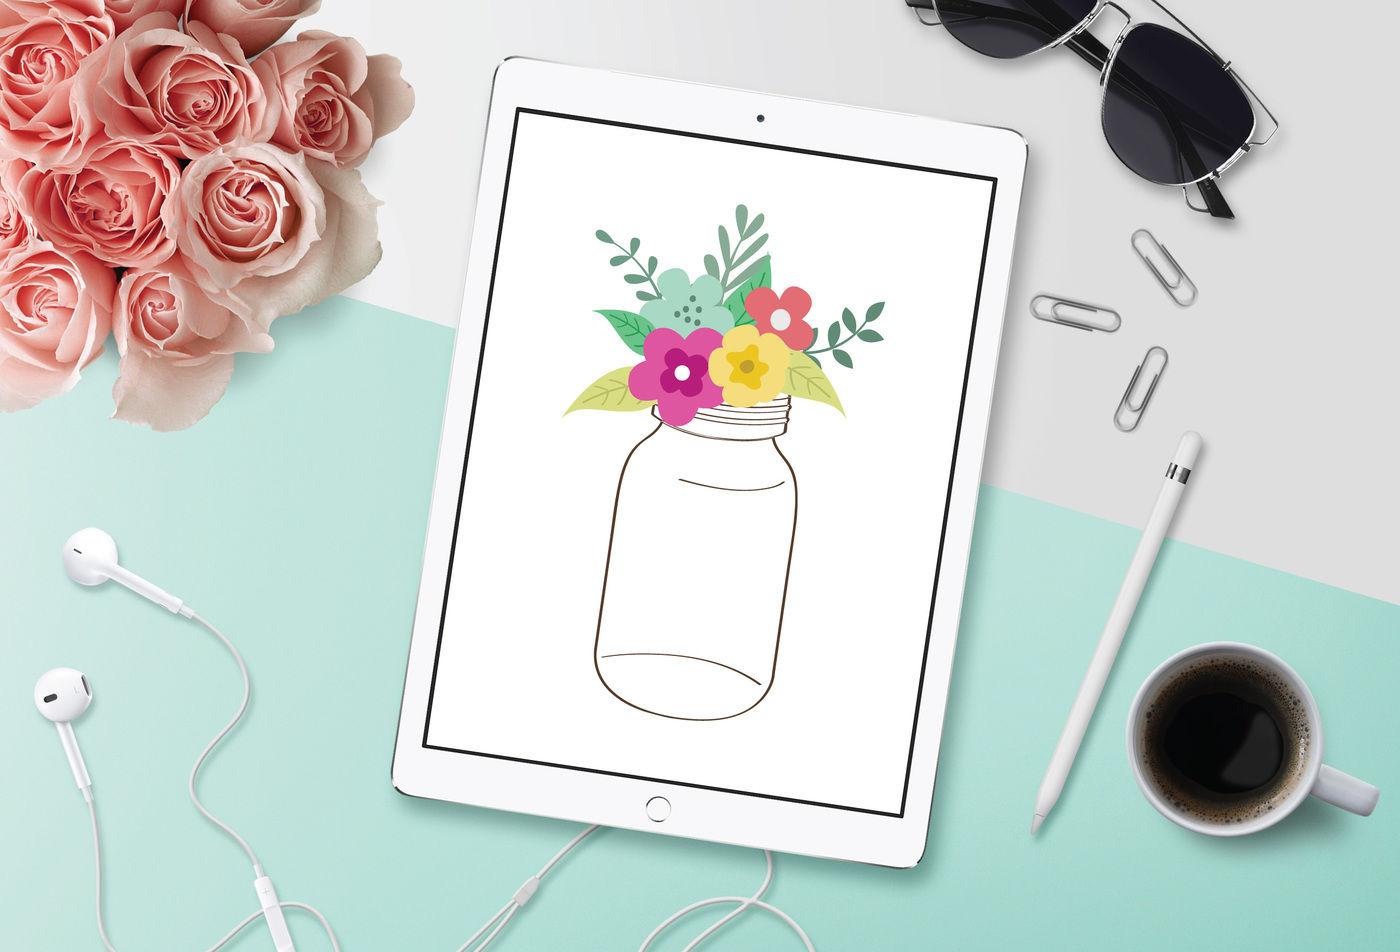 Mason Jar Svg Flowers Svg Dxf File Cuttable File By Bnr Designs